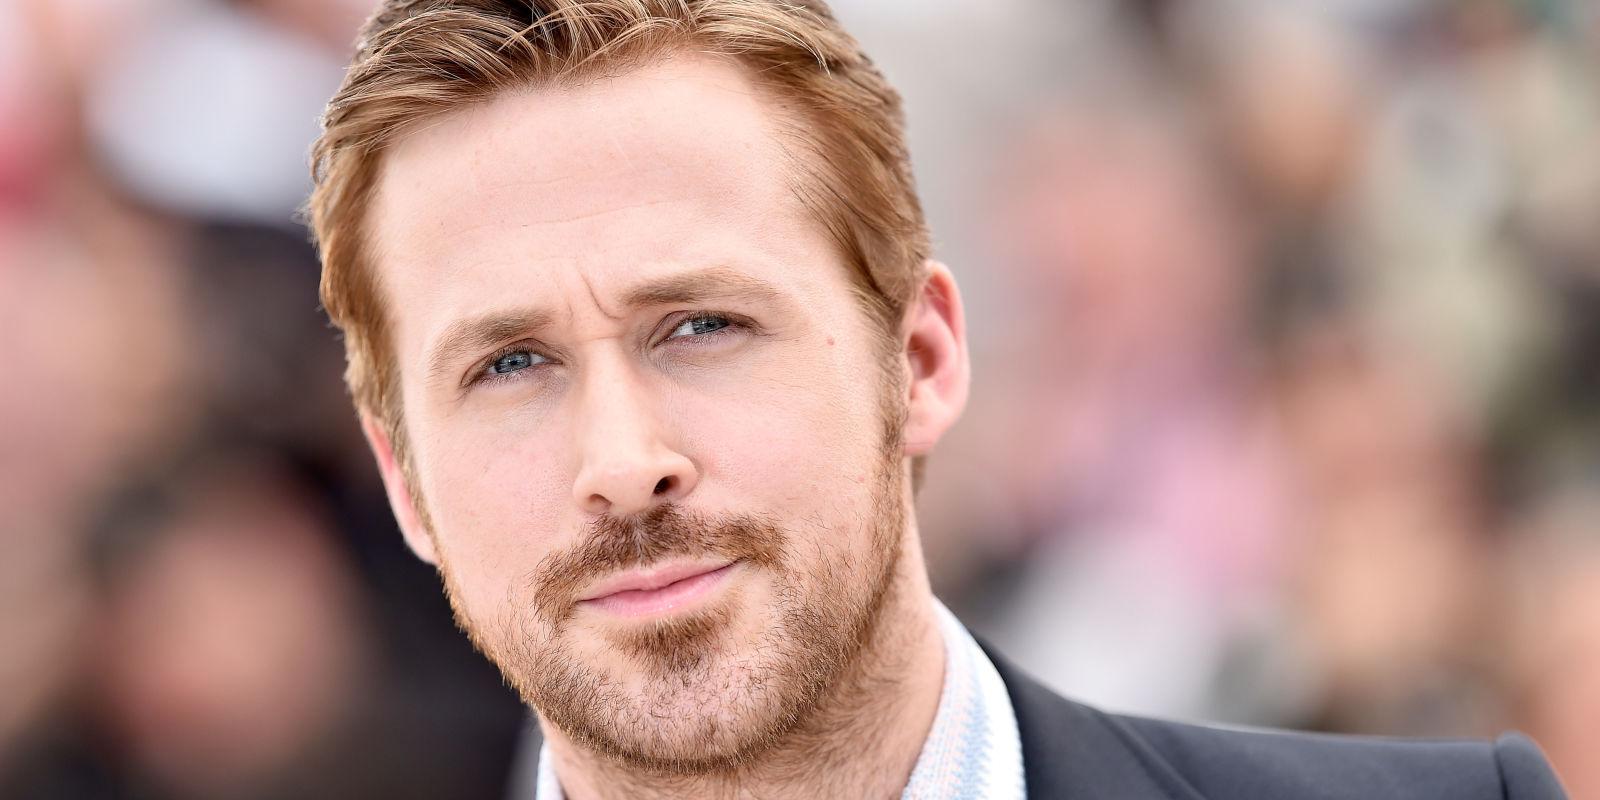 Ryan Gosling Estilo Moda Masculina Masculino Sugar Baby Daddy Mommy Casal Mundo Relacionamento